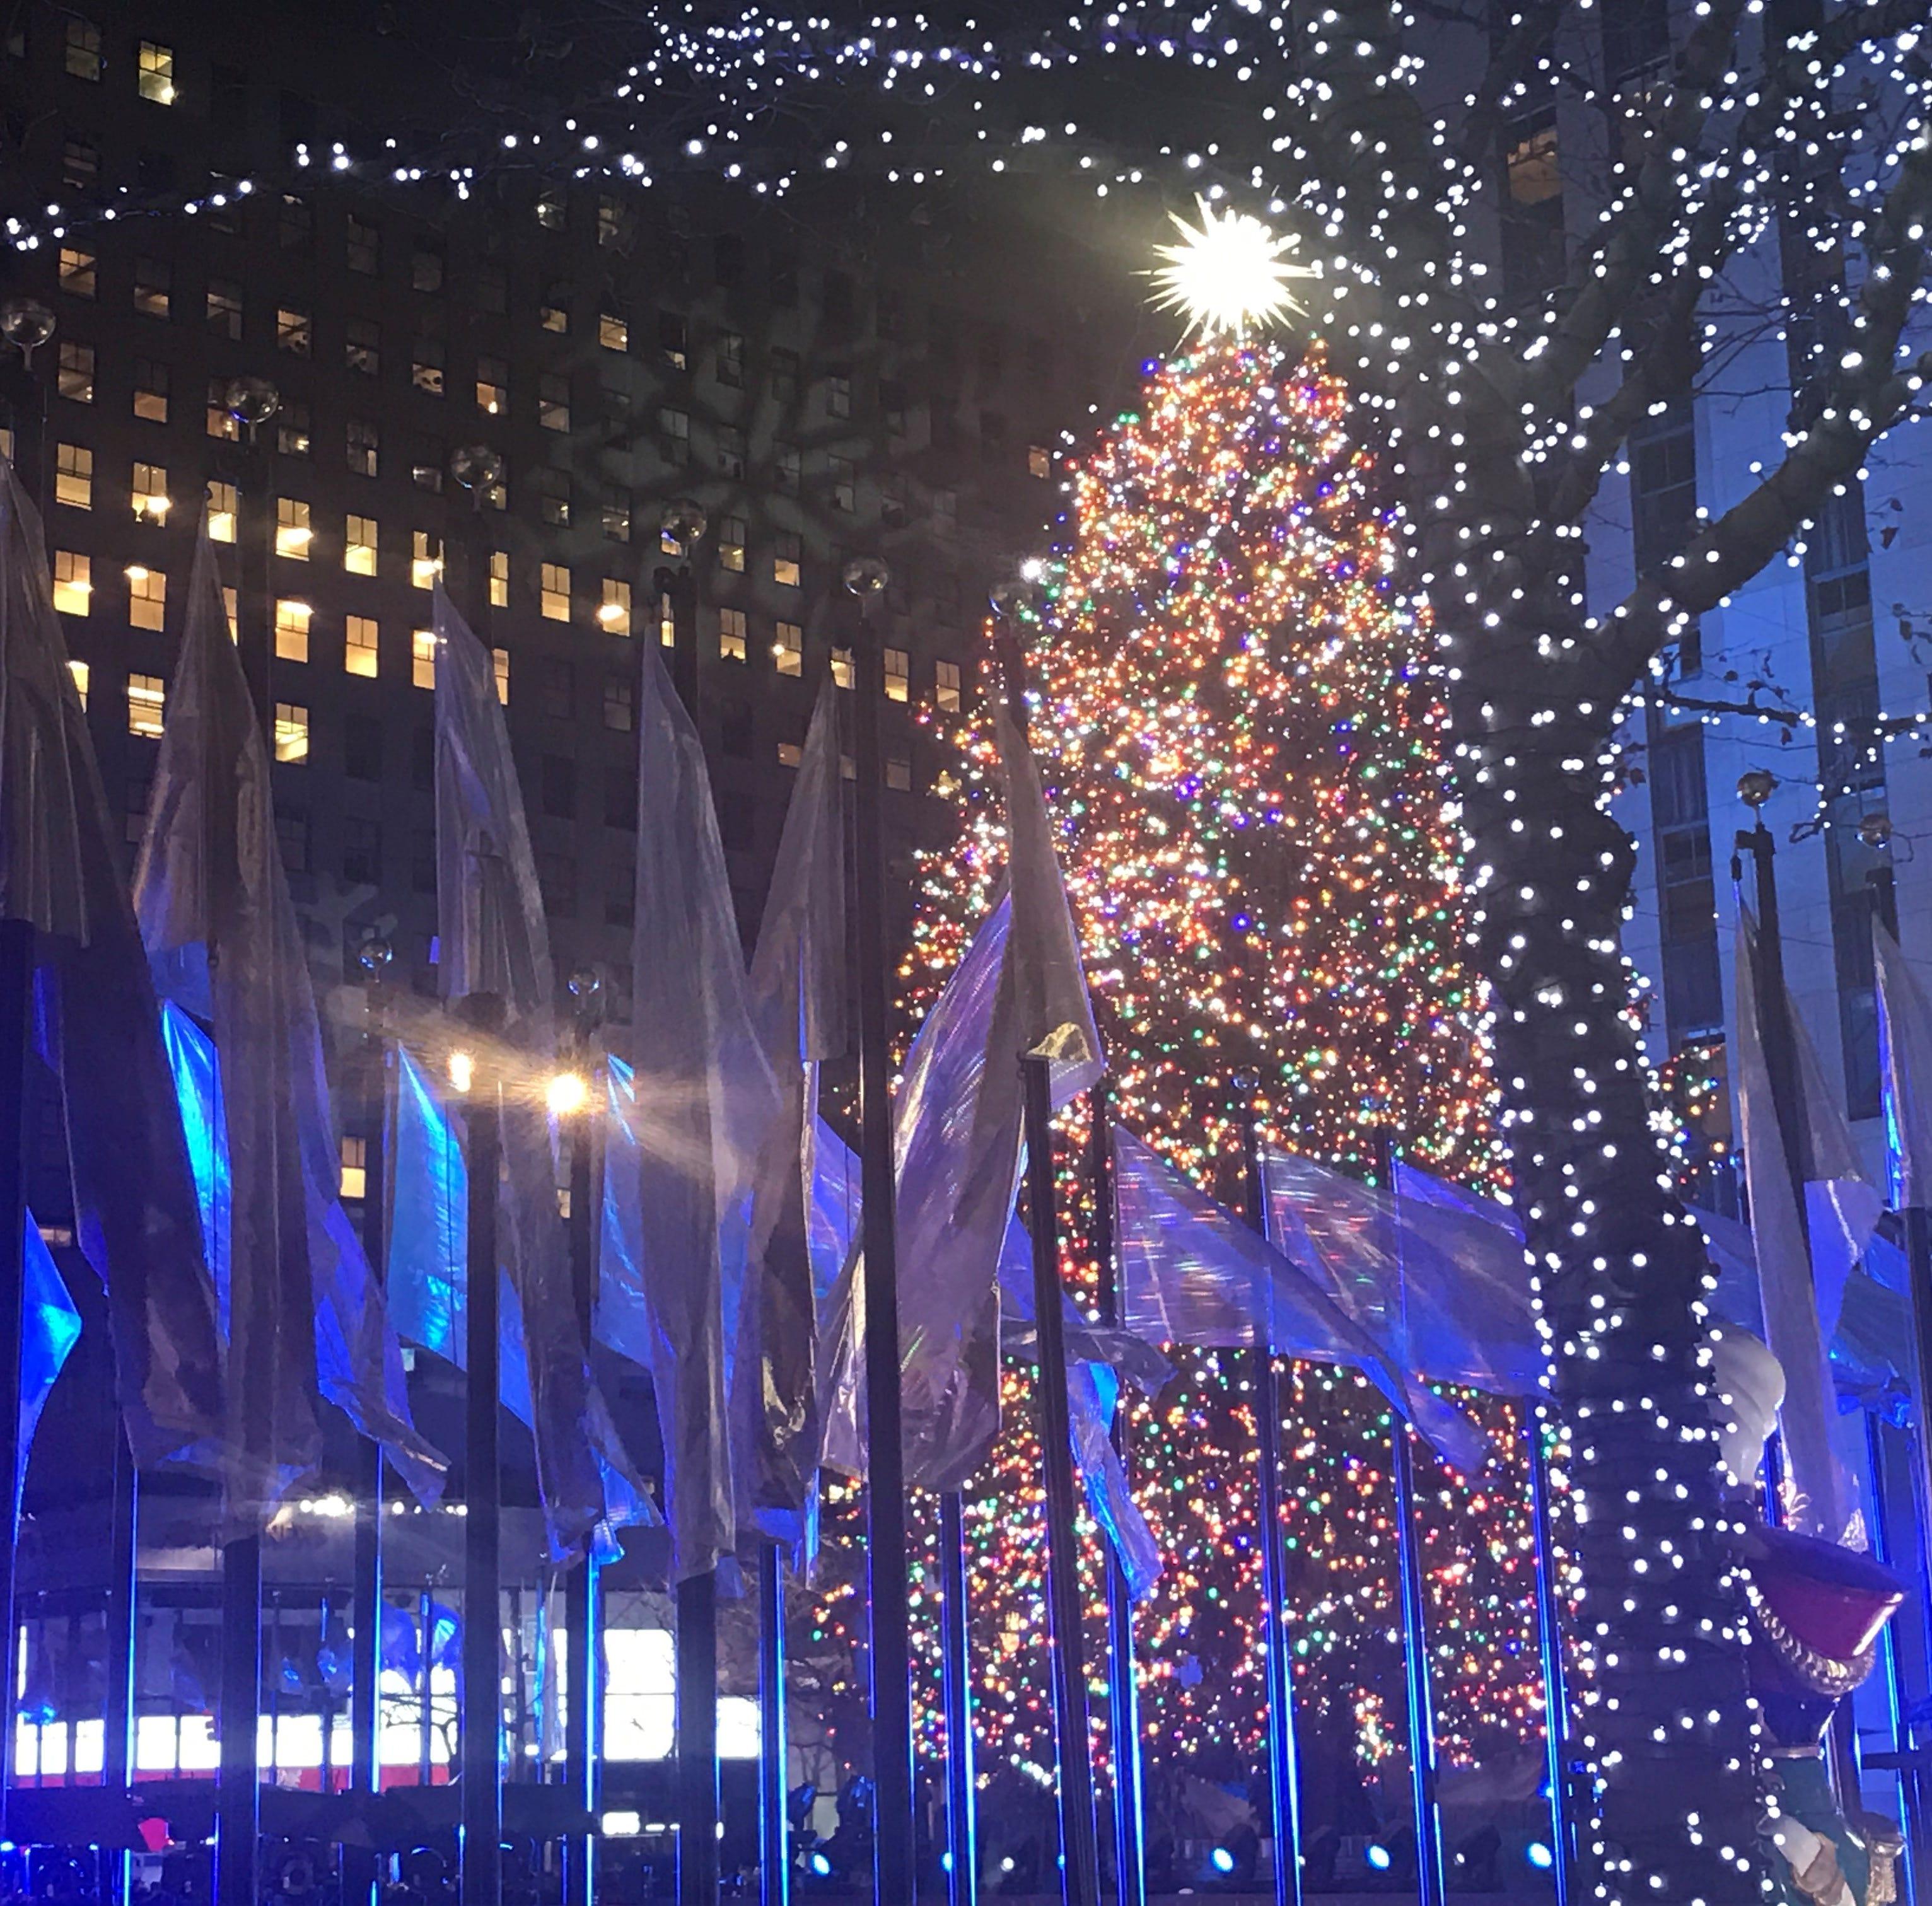 The Rockefeller Christmas Tree has been lit.